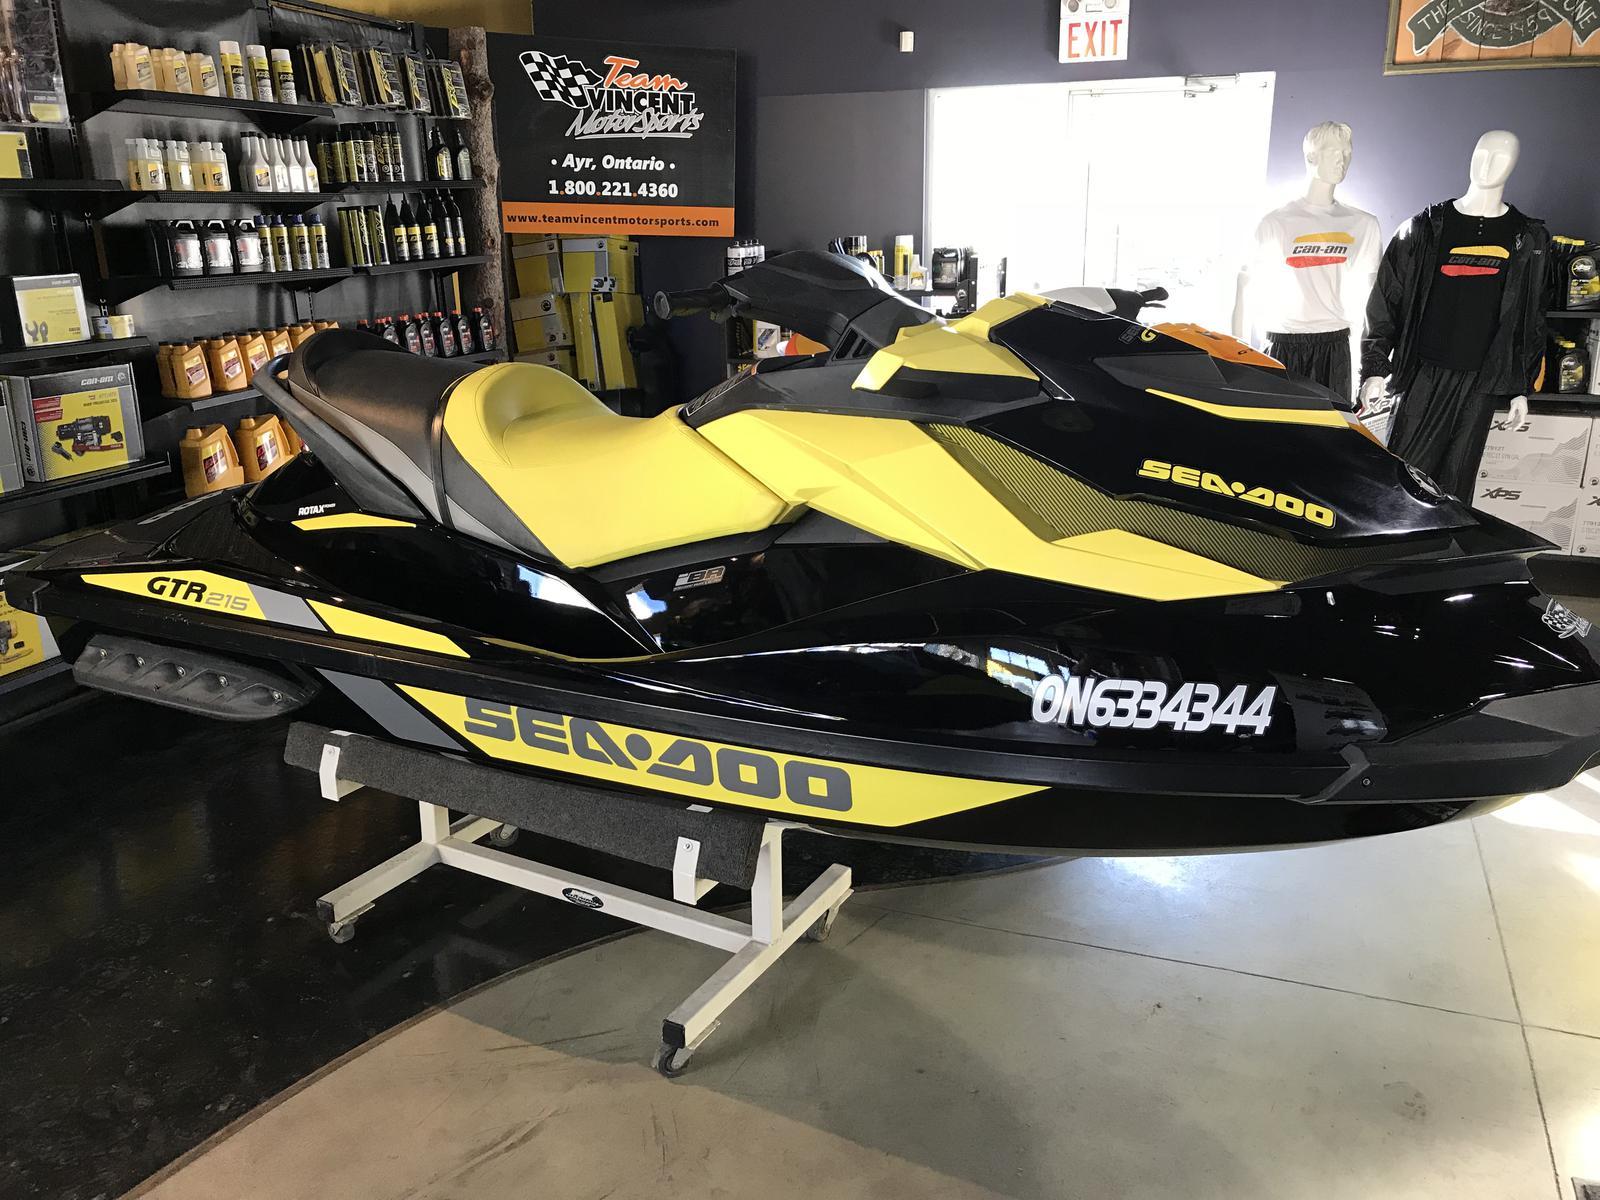 For Sale: 2016 Sea Doo Pwc Seadoo Gtr 215hp ft<br/>Team Vincent Motorsports Inc